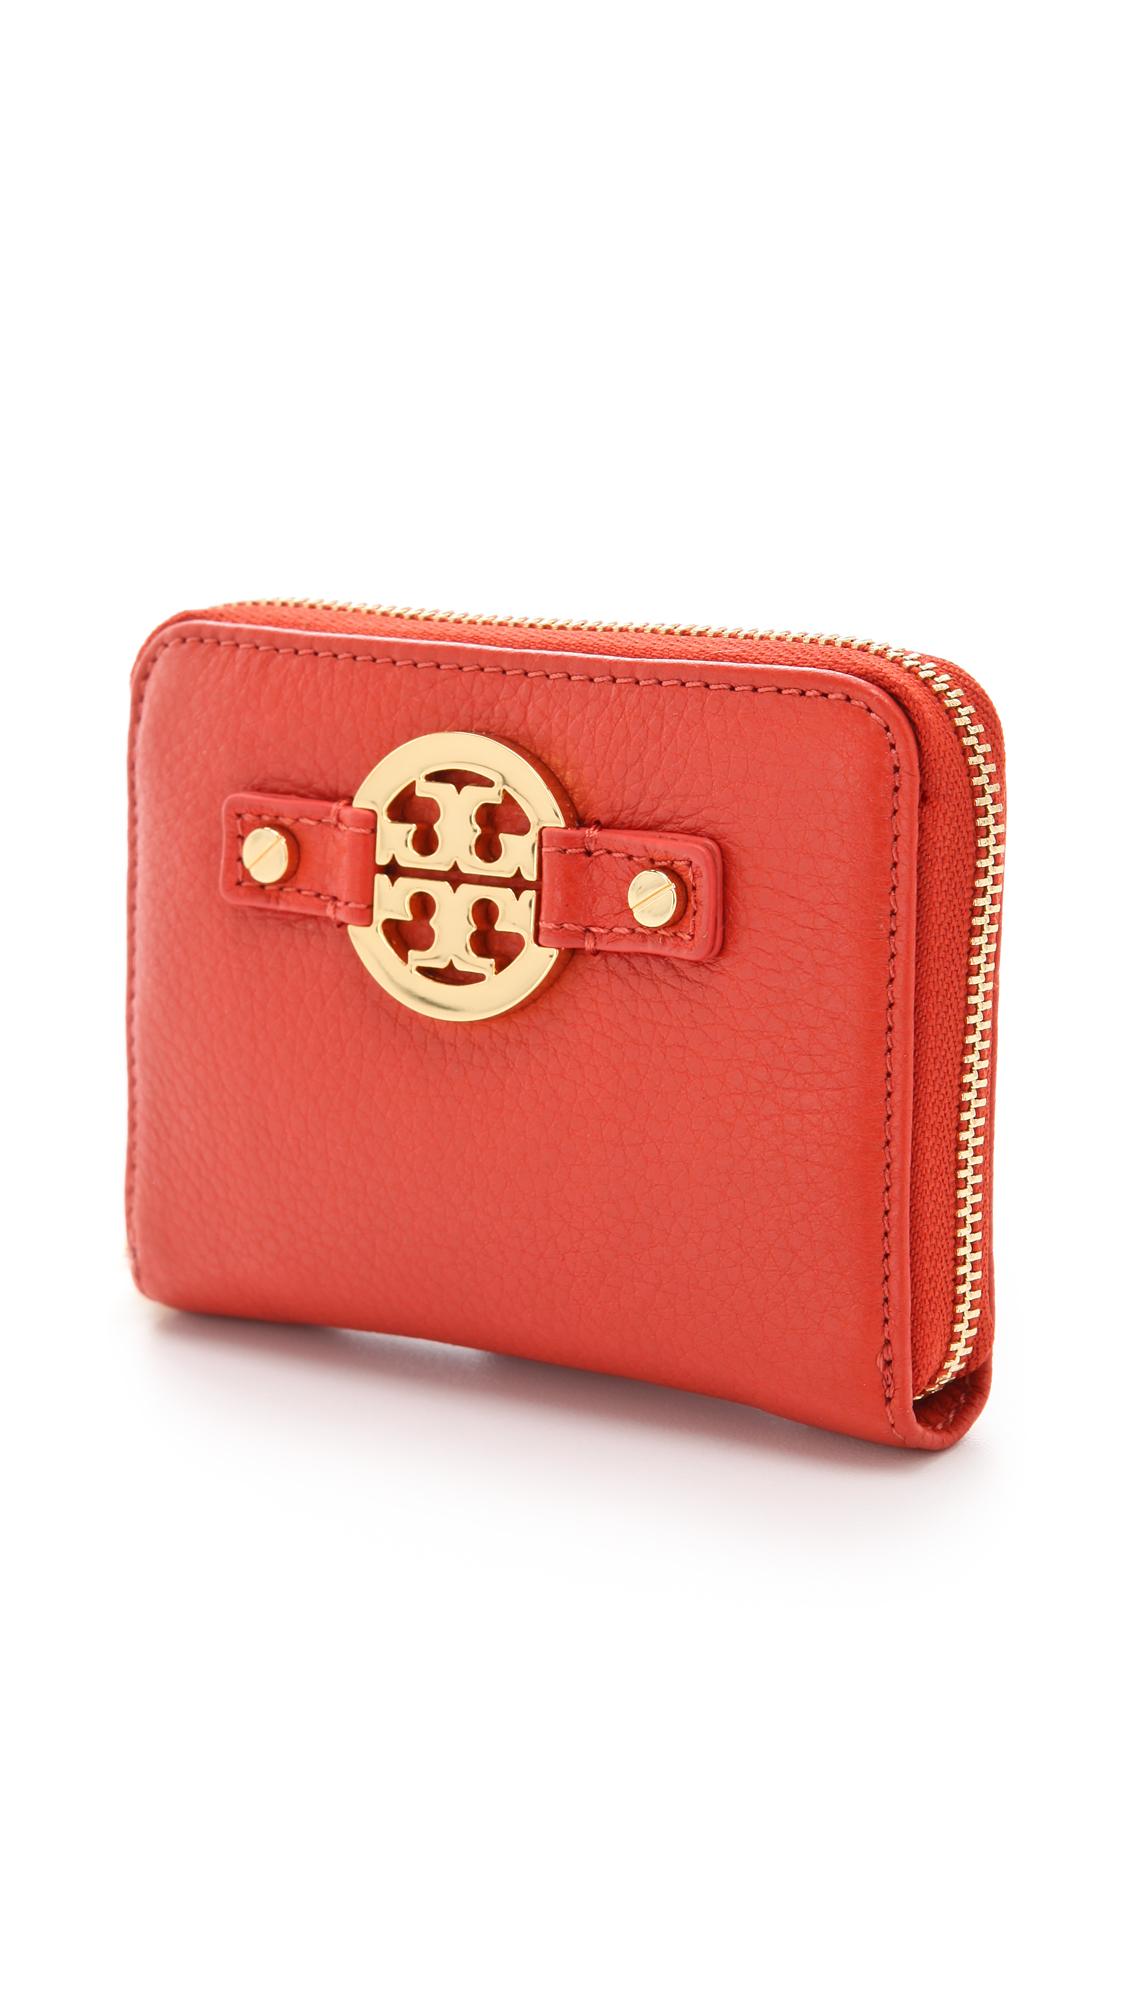 tory burch amanda zip coin wallet in red lyst